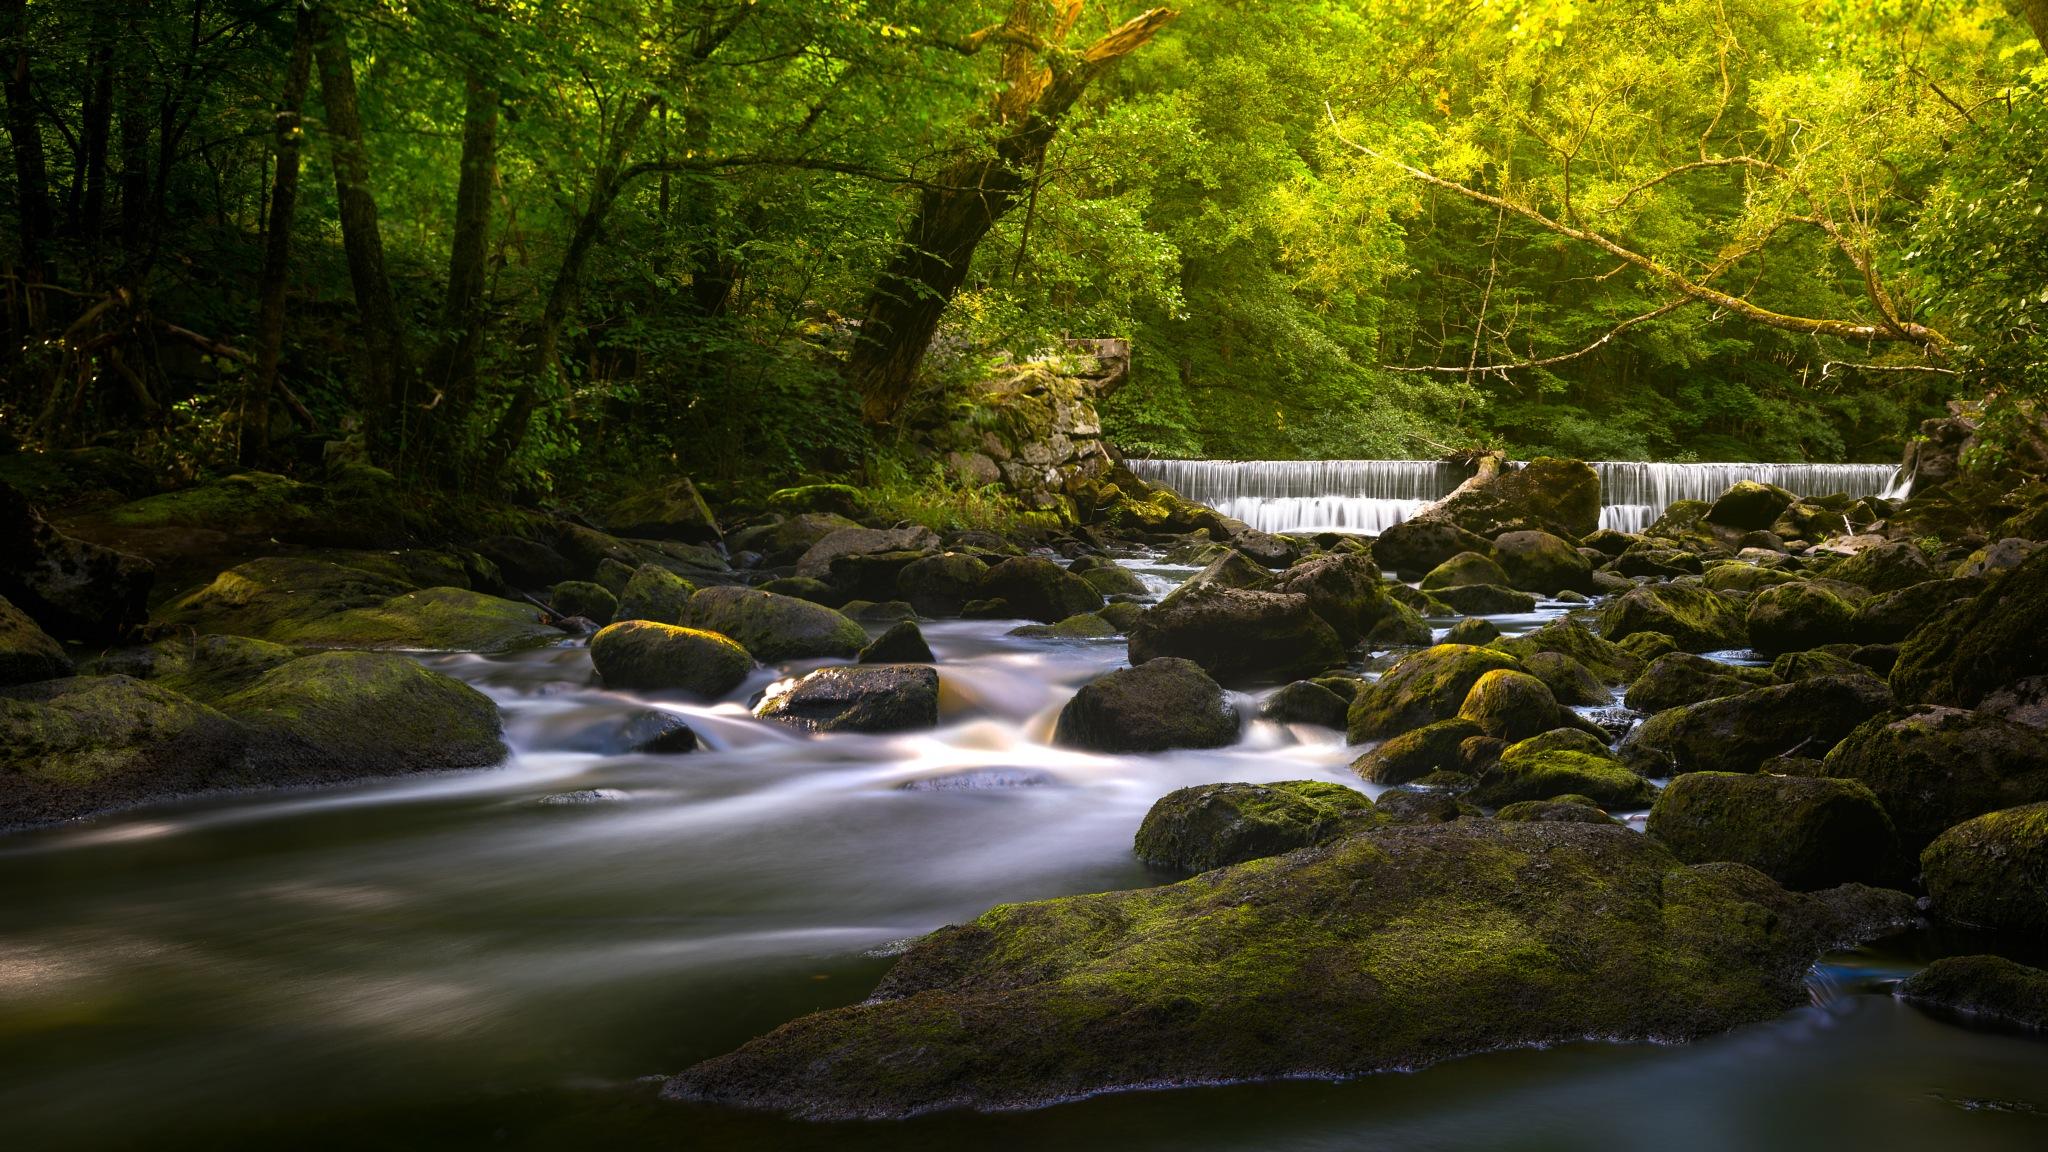 Local Creek by Maths Karlsson